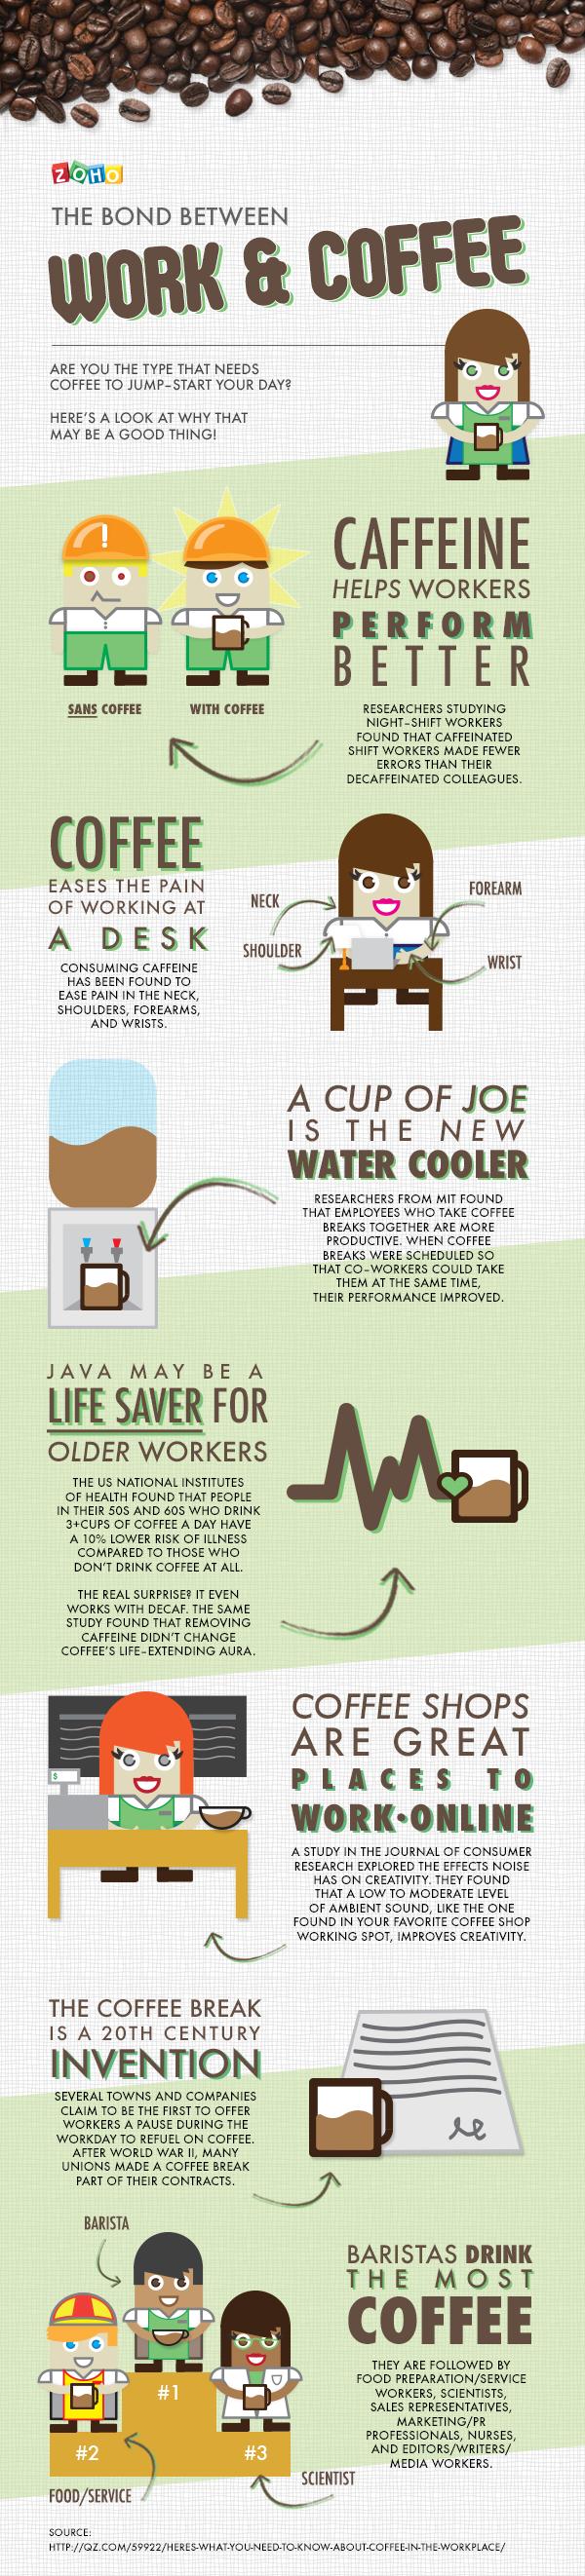 infographic-coffee